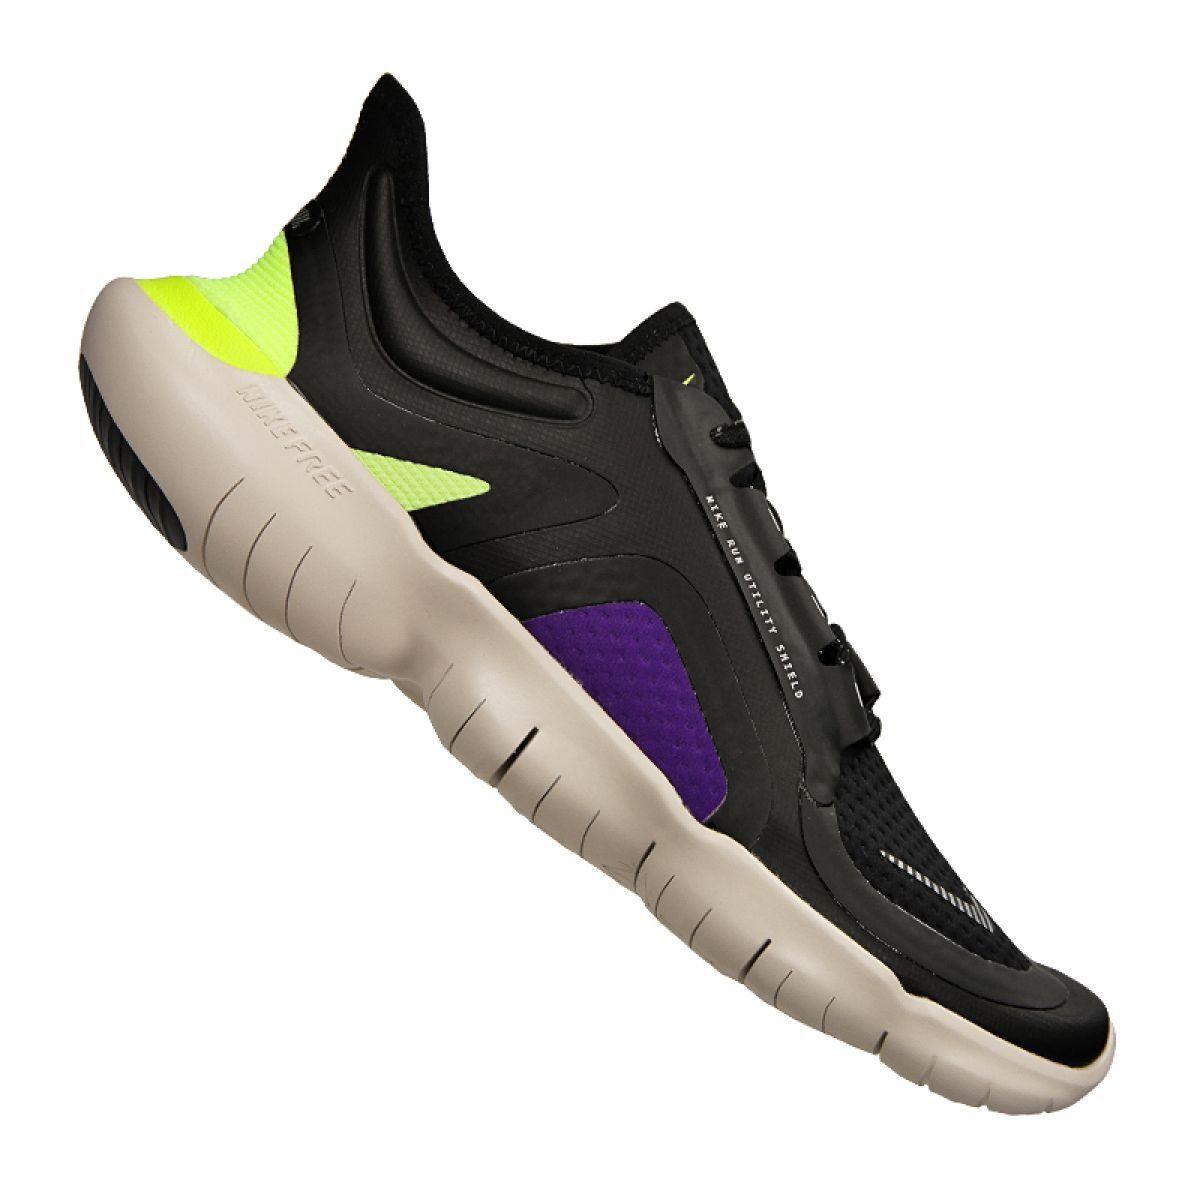 Nike Free on   Nike shoes, Nike free shoes, Sneakers nike